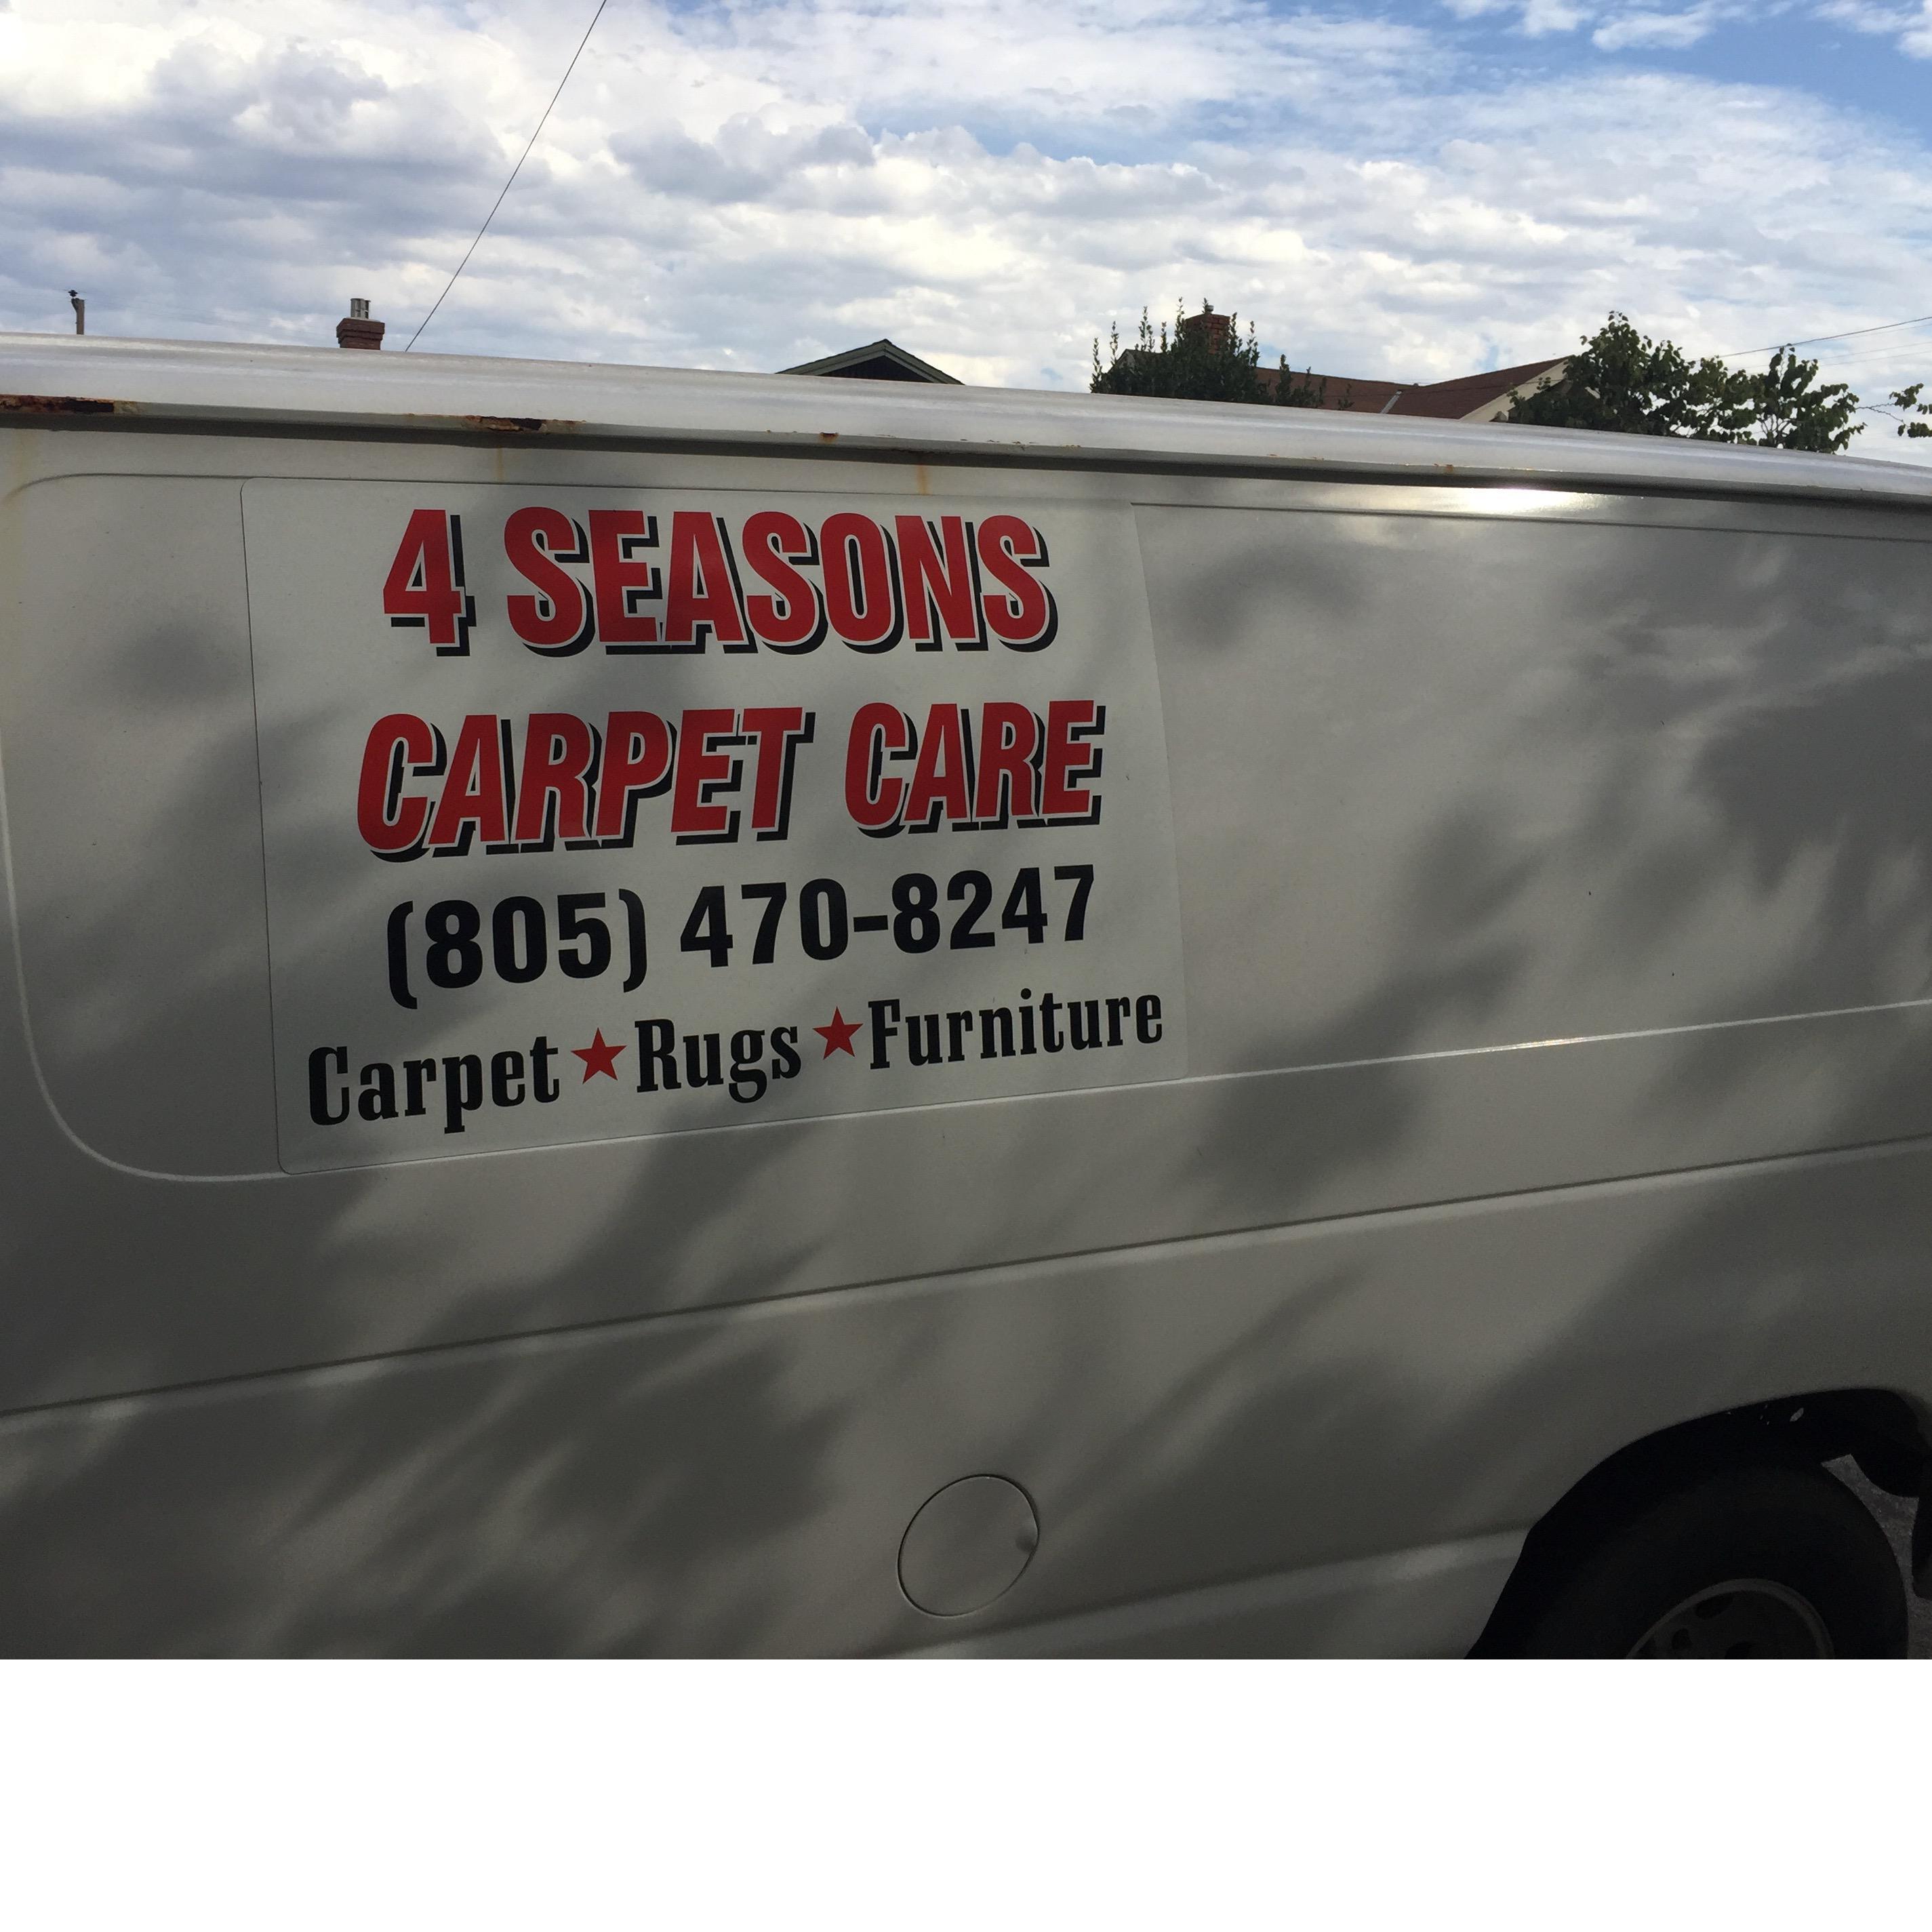 4 Seasons Carpet Care